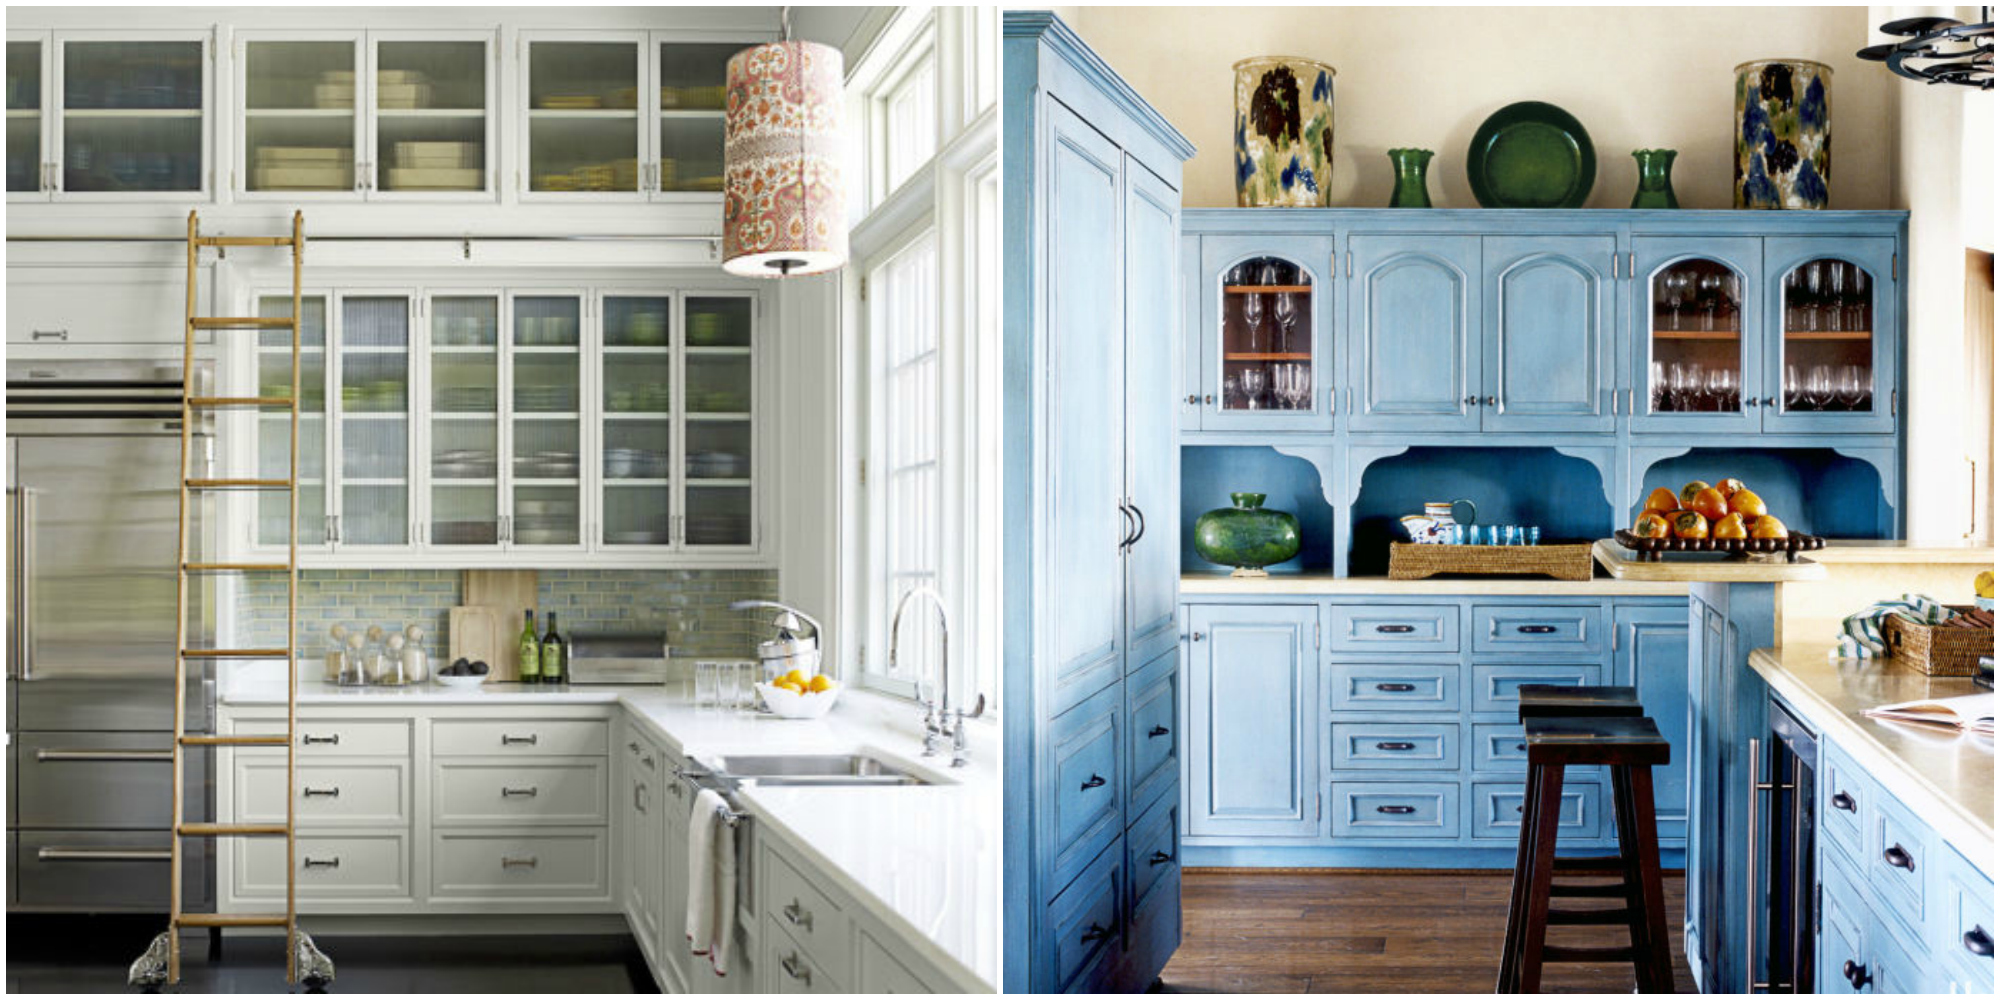 40 Kitchen Cabinet Design Ideas - Unique Kitchen Cabinets